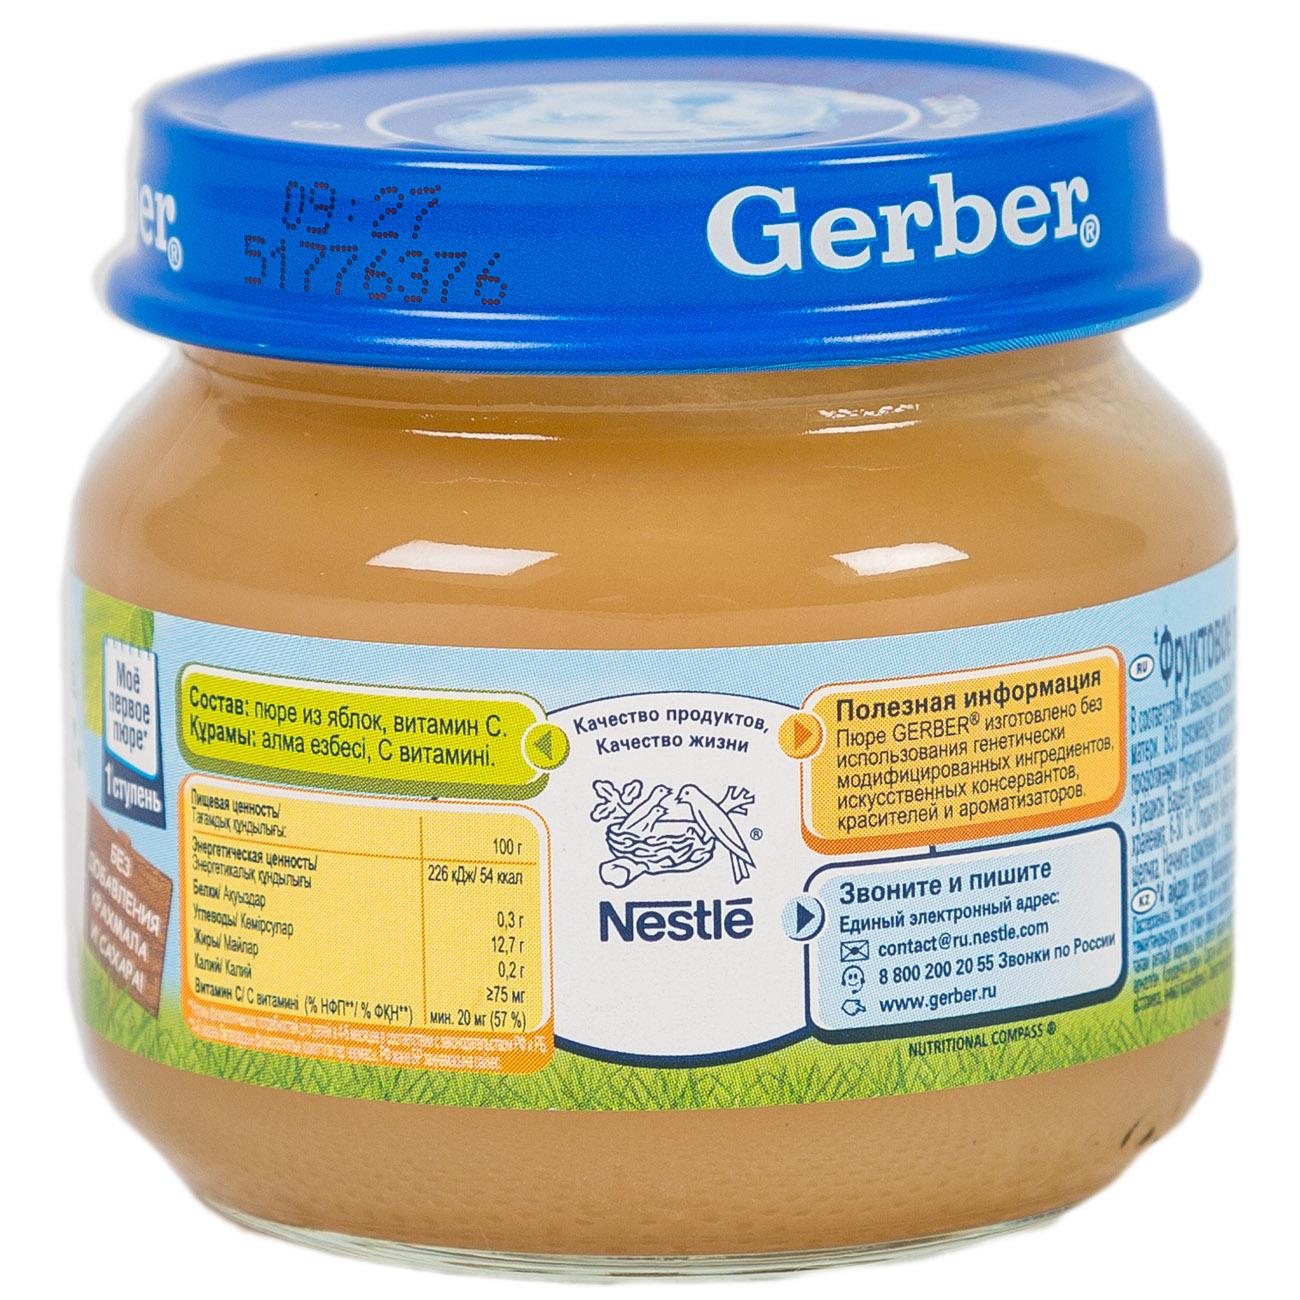 ���� Gerber ��������� 80 �� ������ (1 �������)